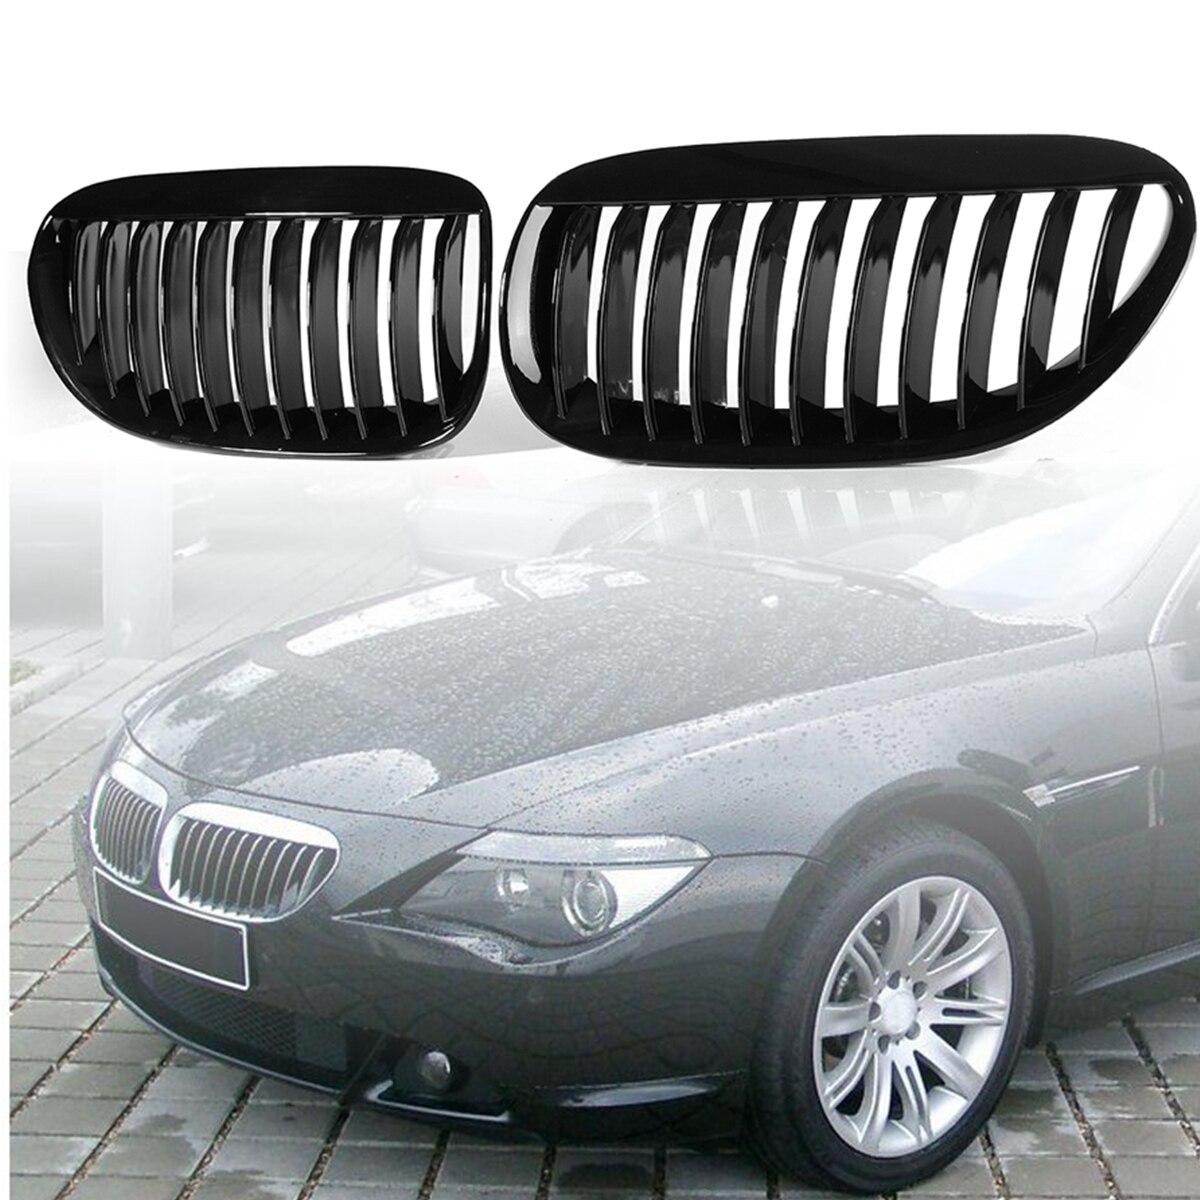 Pair Gloss Black Front Grilles R&L for BMW E63/E64 M6 650Ci 645Ci 2005 2006 2007 2008 2009 2010